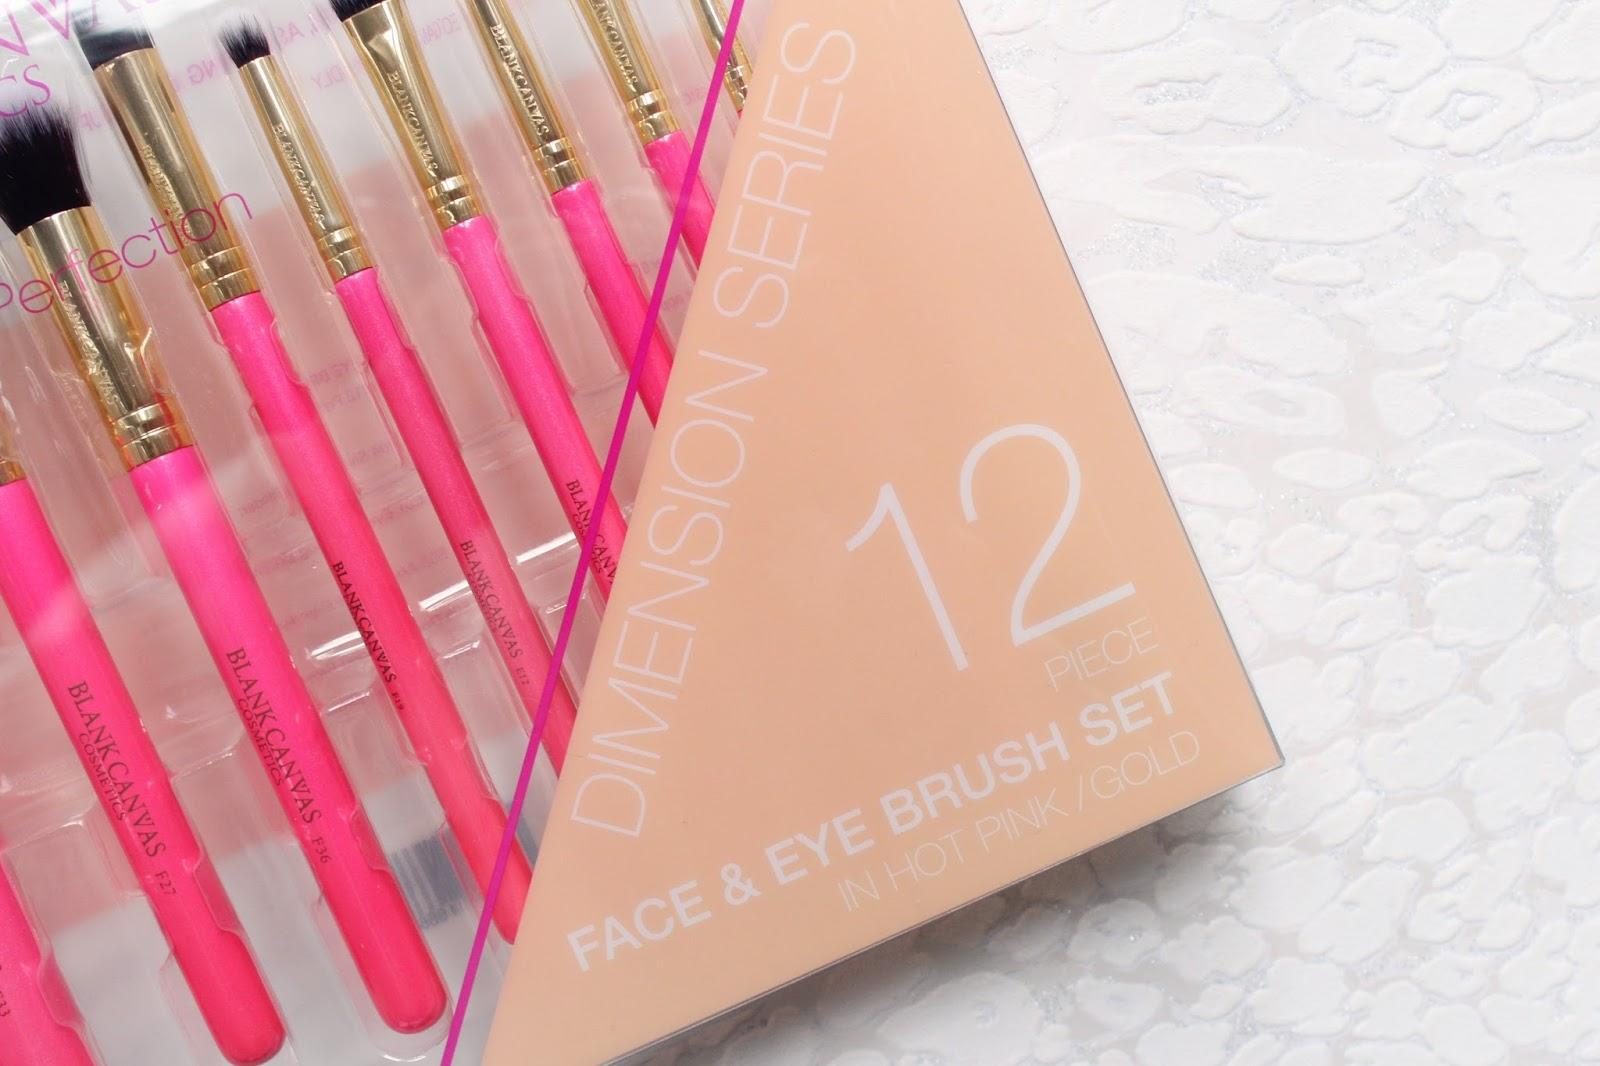 Blank Canvas 12 Piece Hot Pink & Gold Brush Set